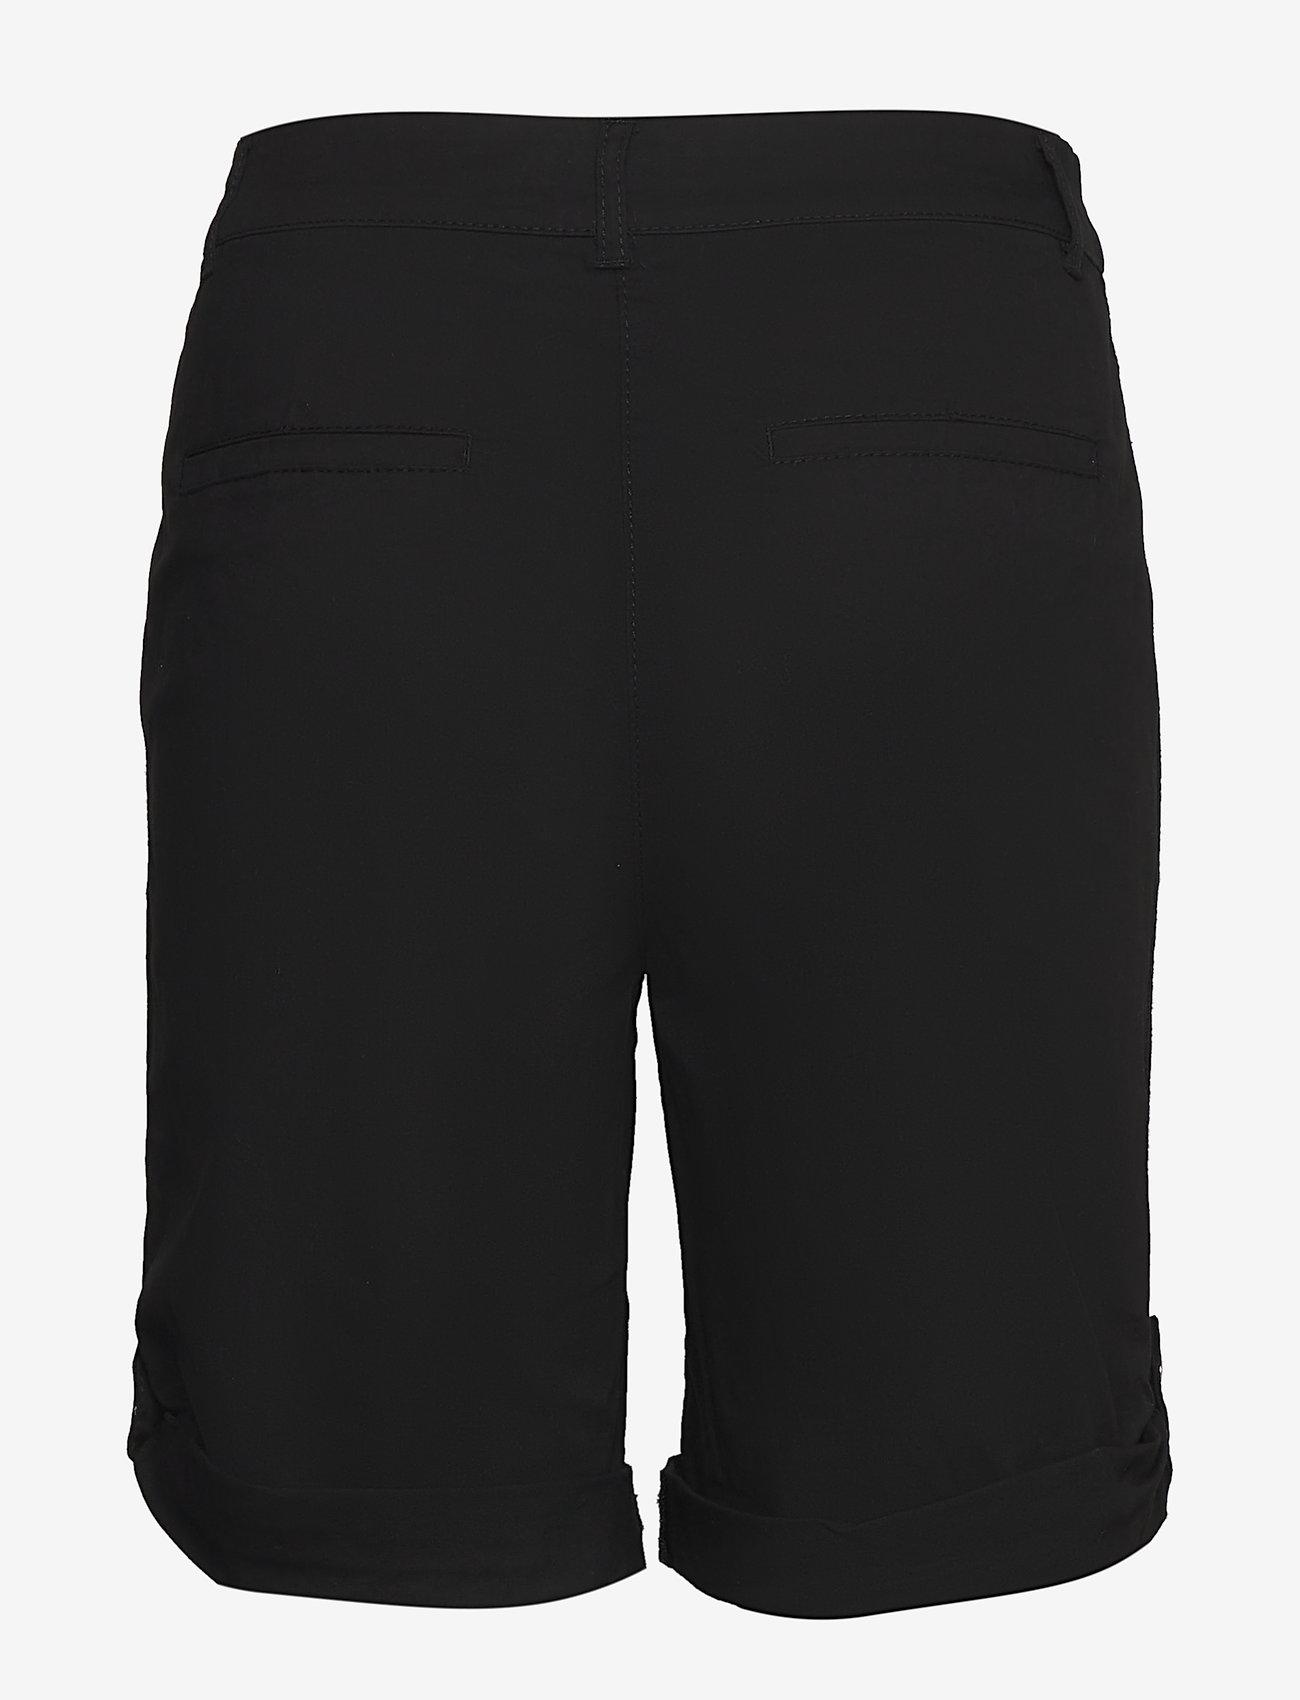 Casual Shorts (Black) (239.40 kr) - Brandtex